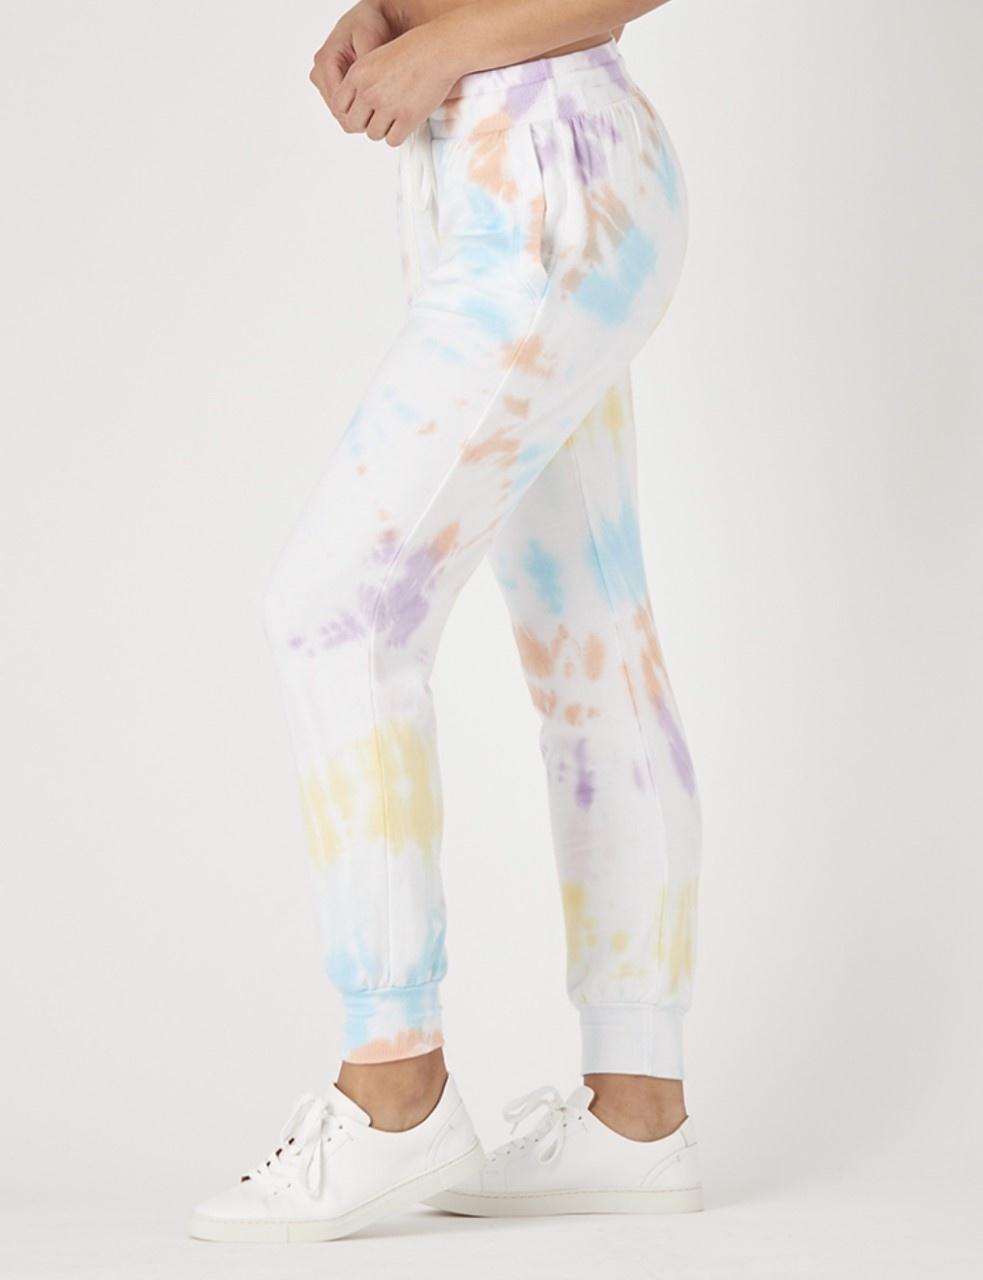 Glyder Halfway Jogger Rainbow Tie Dye